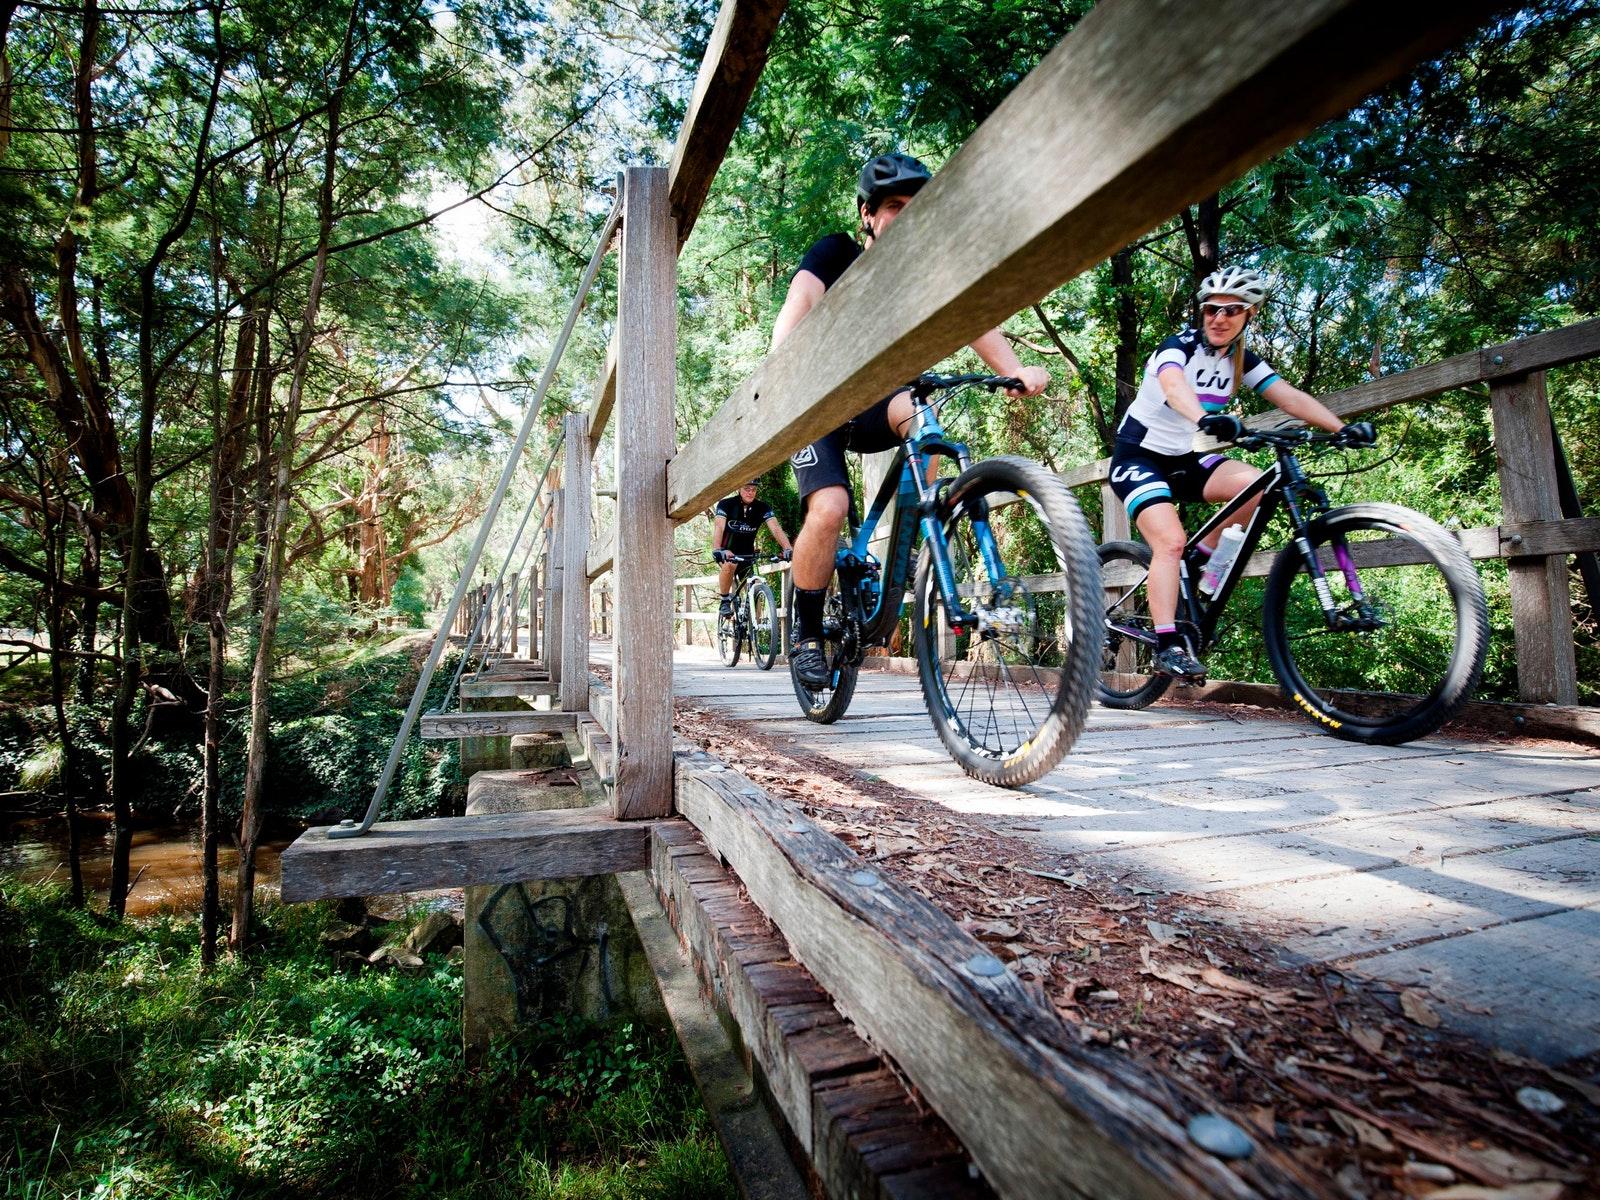 Timber bridge over Little Yarra. Wesburn